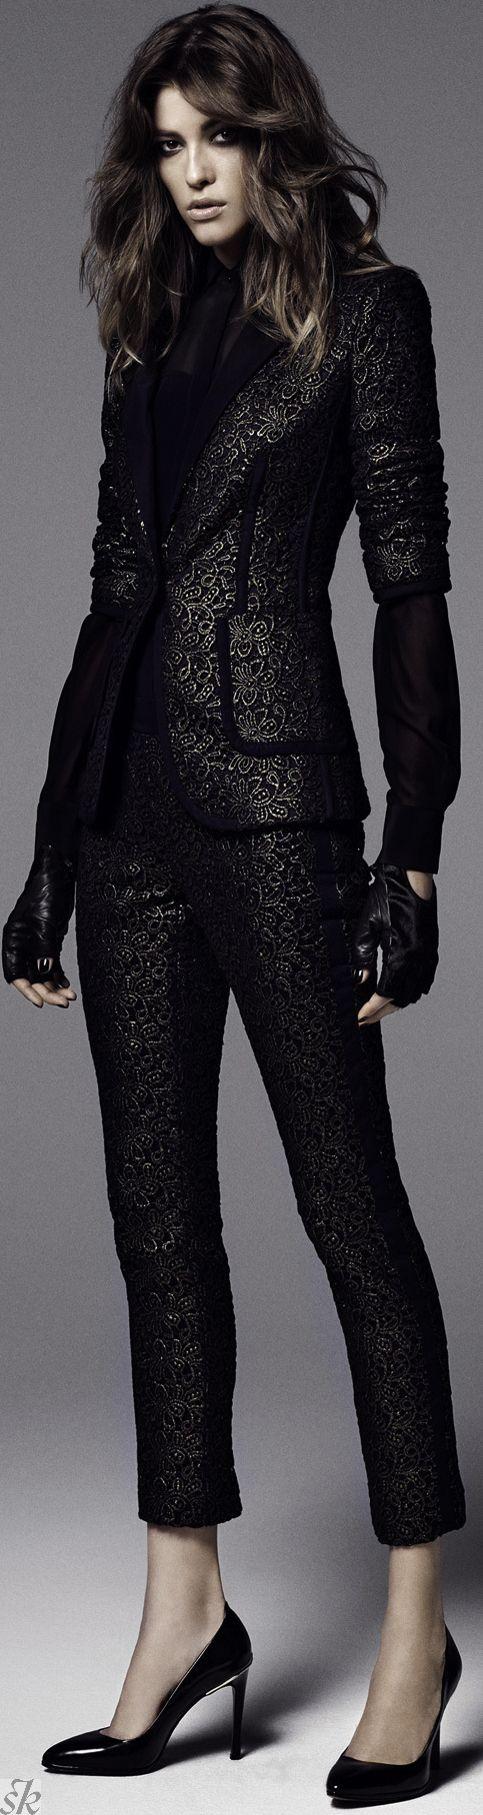 Rachel Zoe Fall autumn women fashion outfit clothing stylish apparel @roressclothes closet ideas